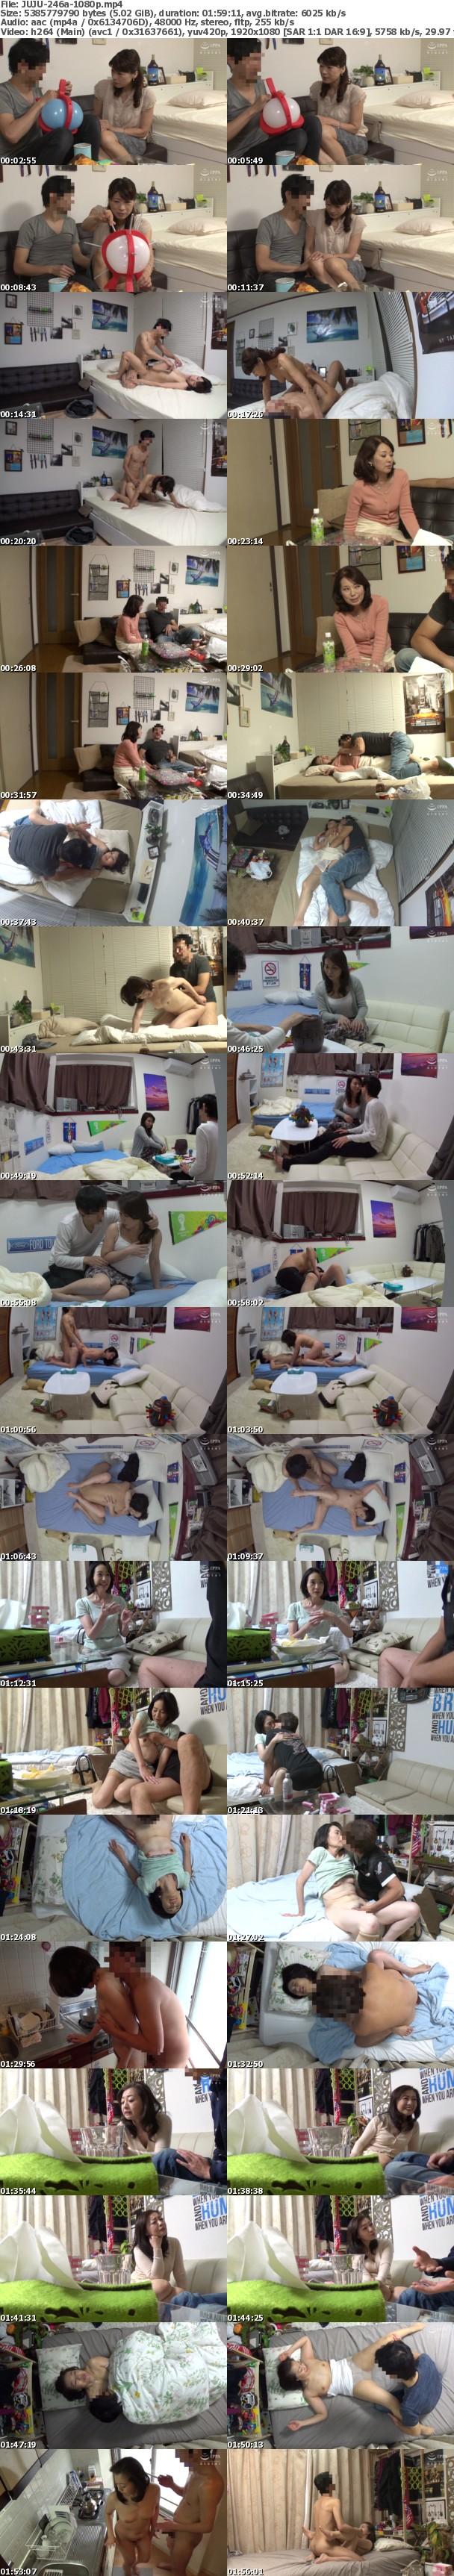 (Full HD) JUJU-246 五十路六十路熟女特大号!!~若いイケメンに迫られ中出し了承した熟女たち~ 乗せられ煽てられ調子に乗っちゃった乳首ビンビンぺったん乳完熟おばさんをナンパ連れ込みSEX 20人8時間